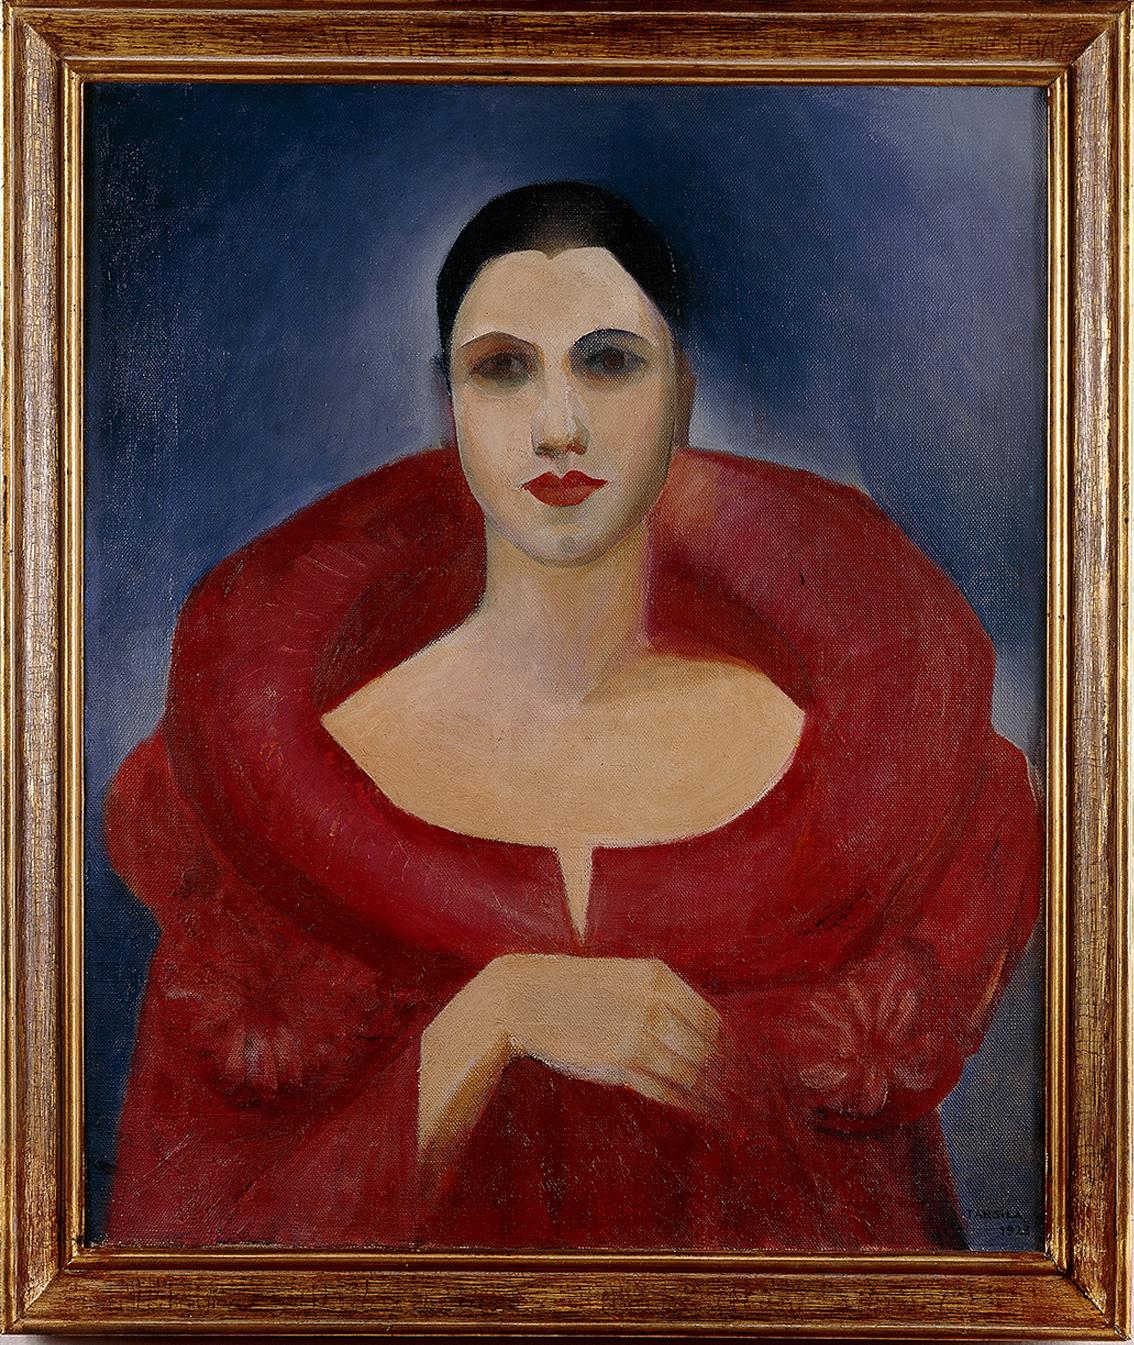 Autorretrato (Manteau Rouge)